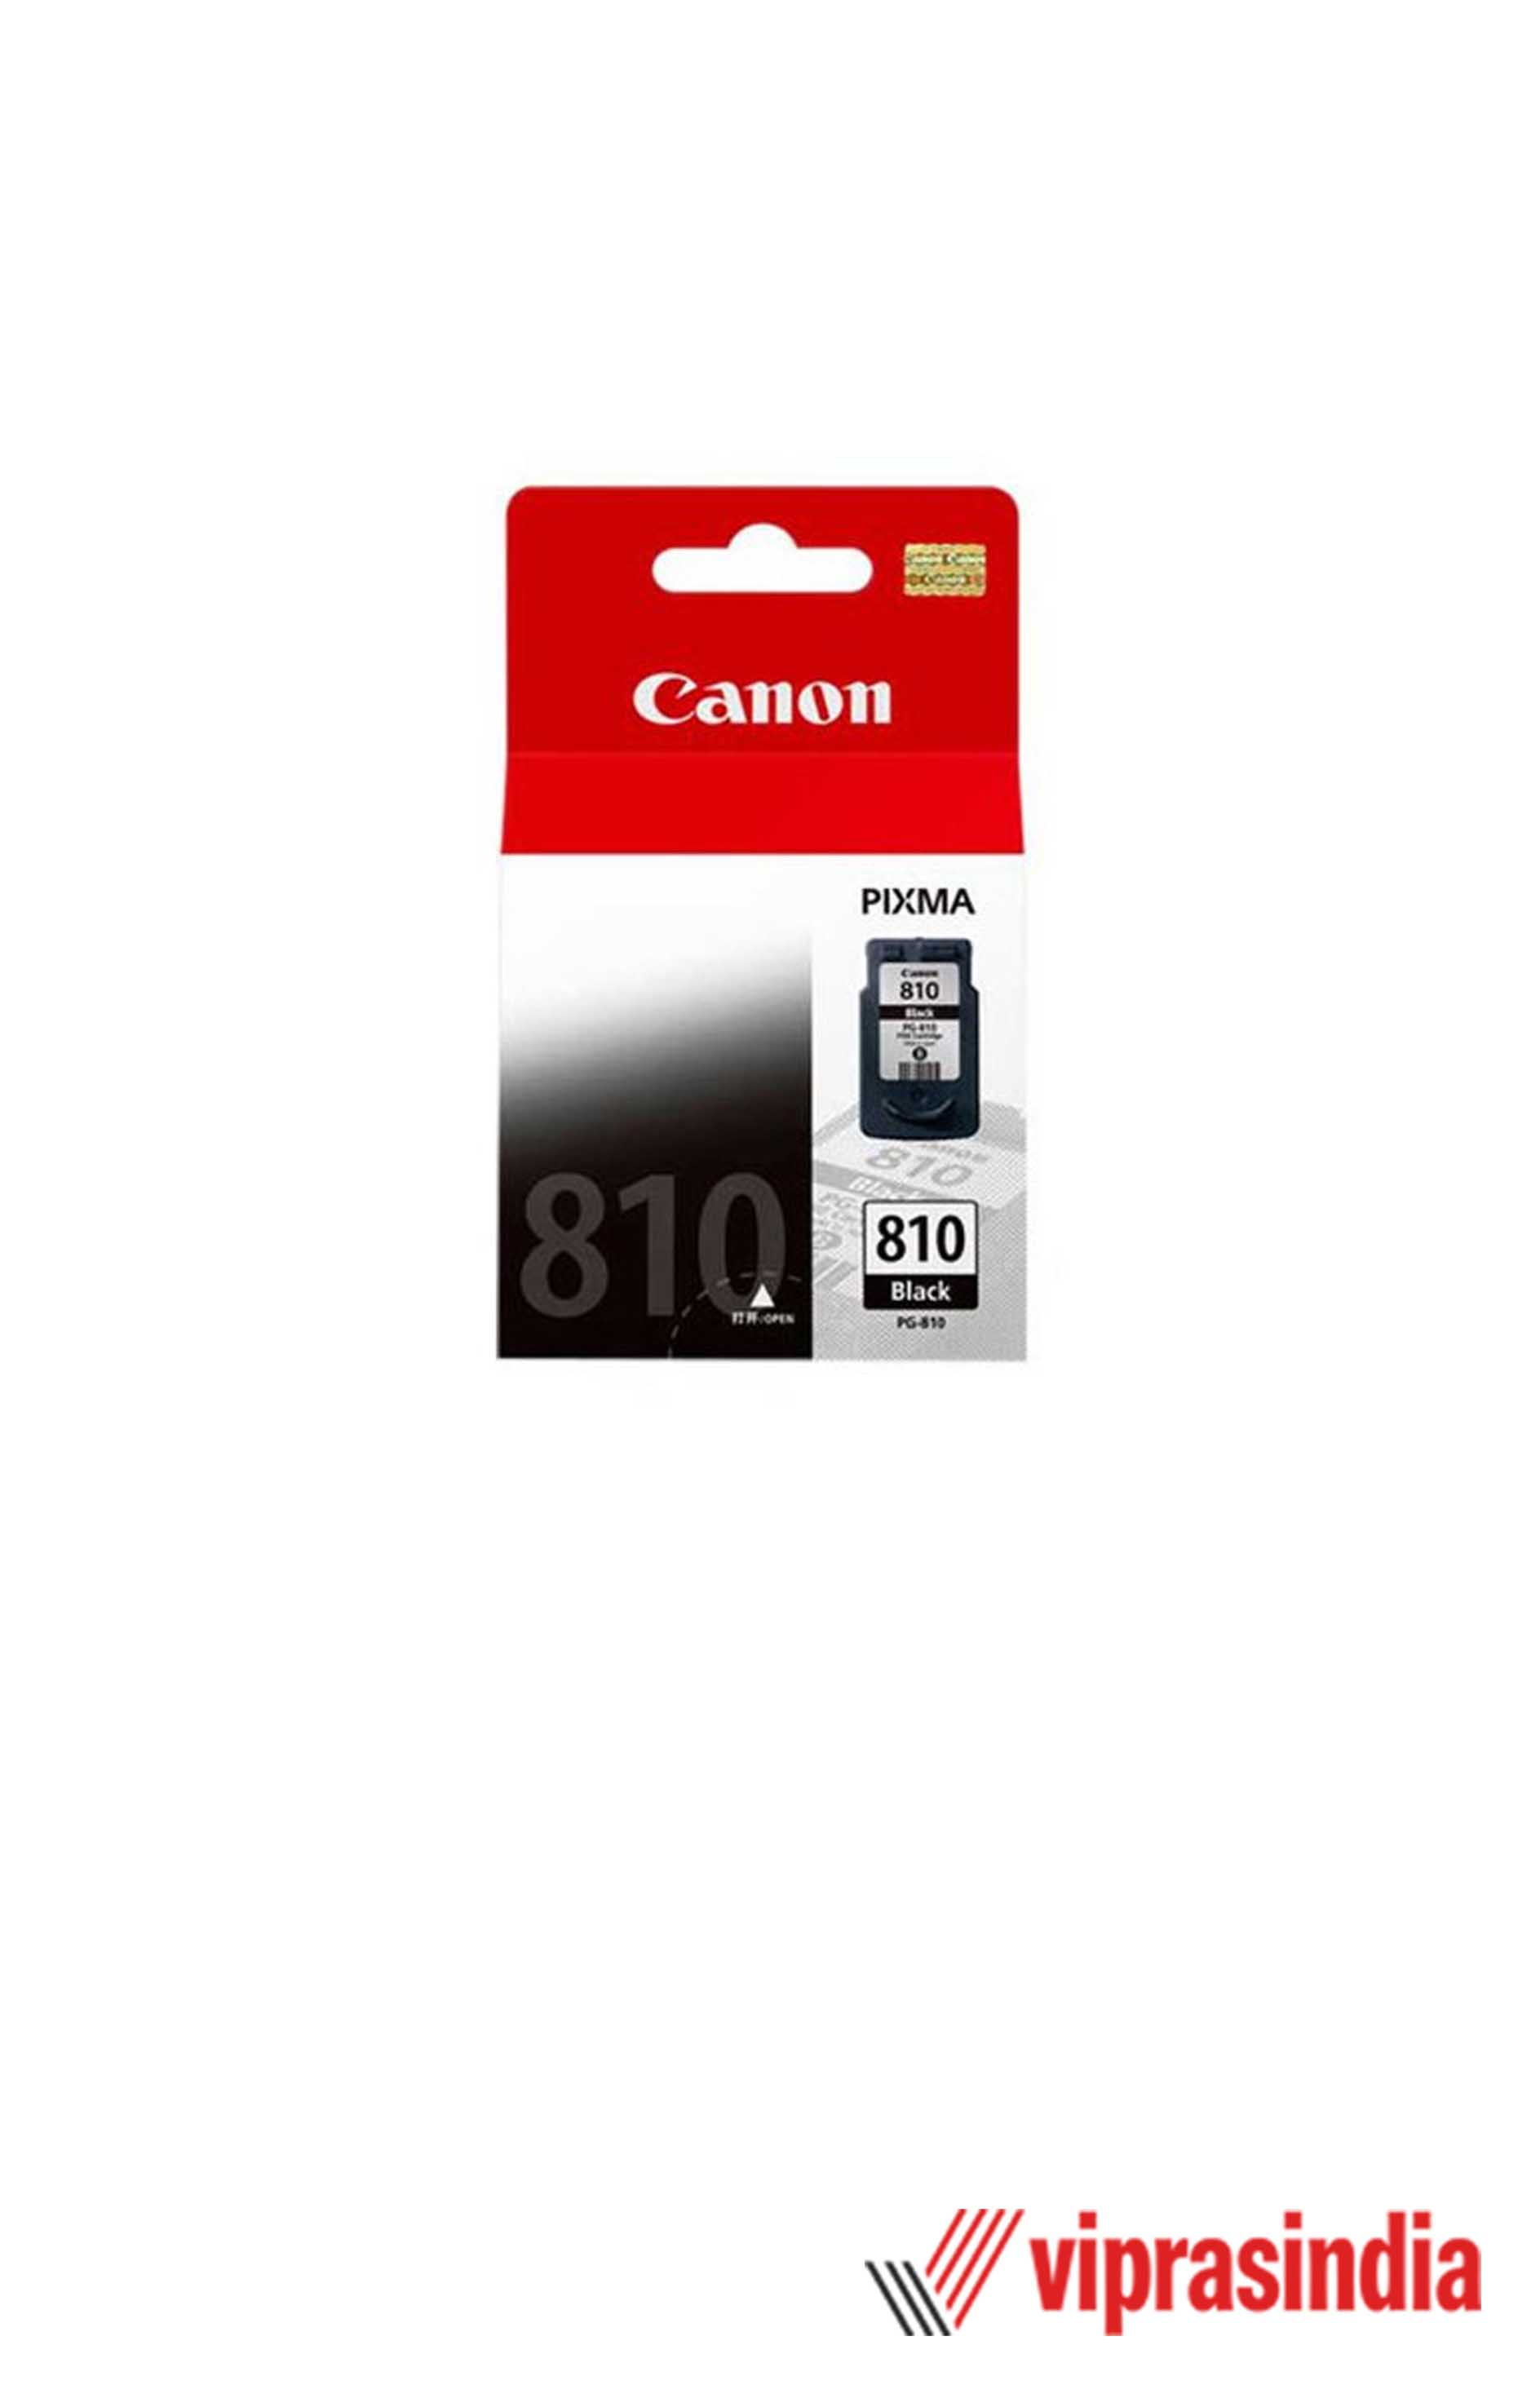 Cartridge canon pixma 810 black PG 810